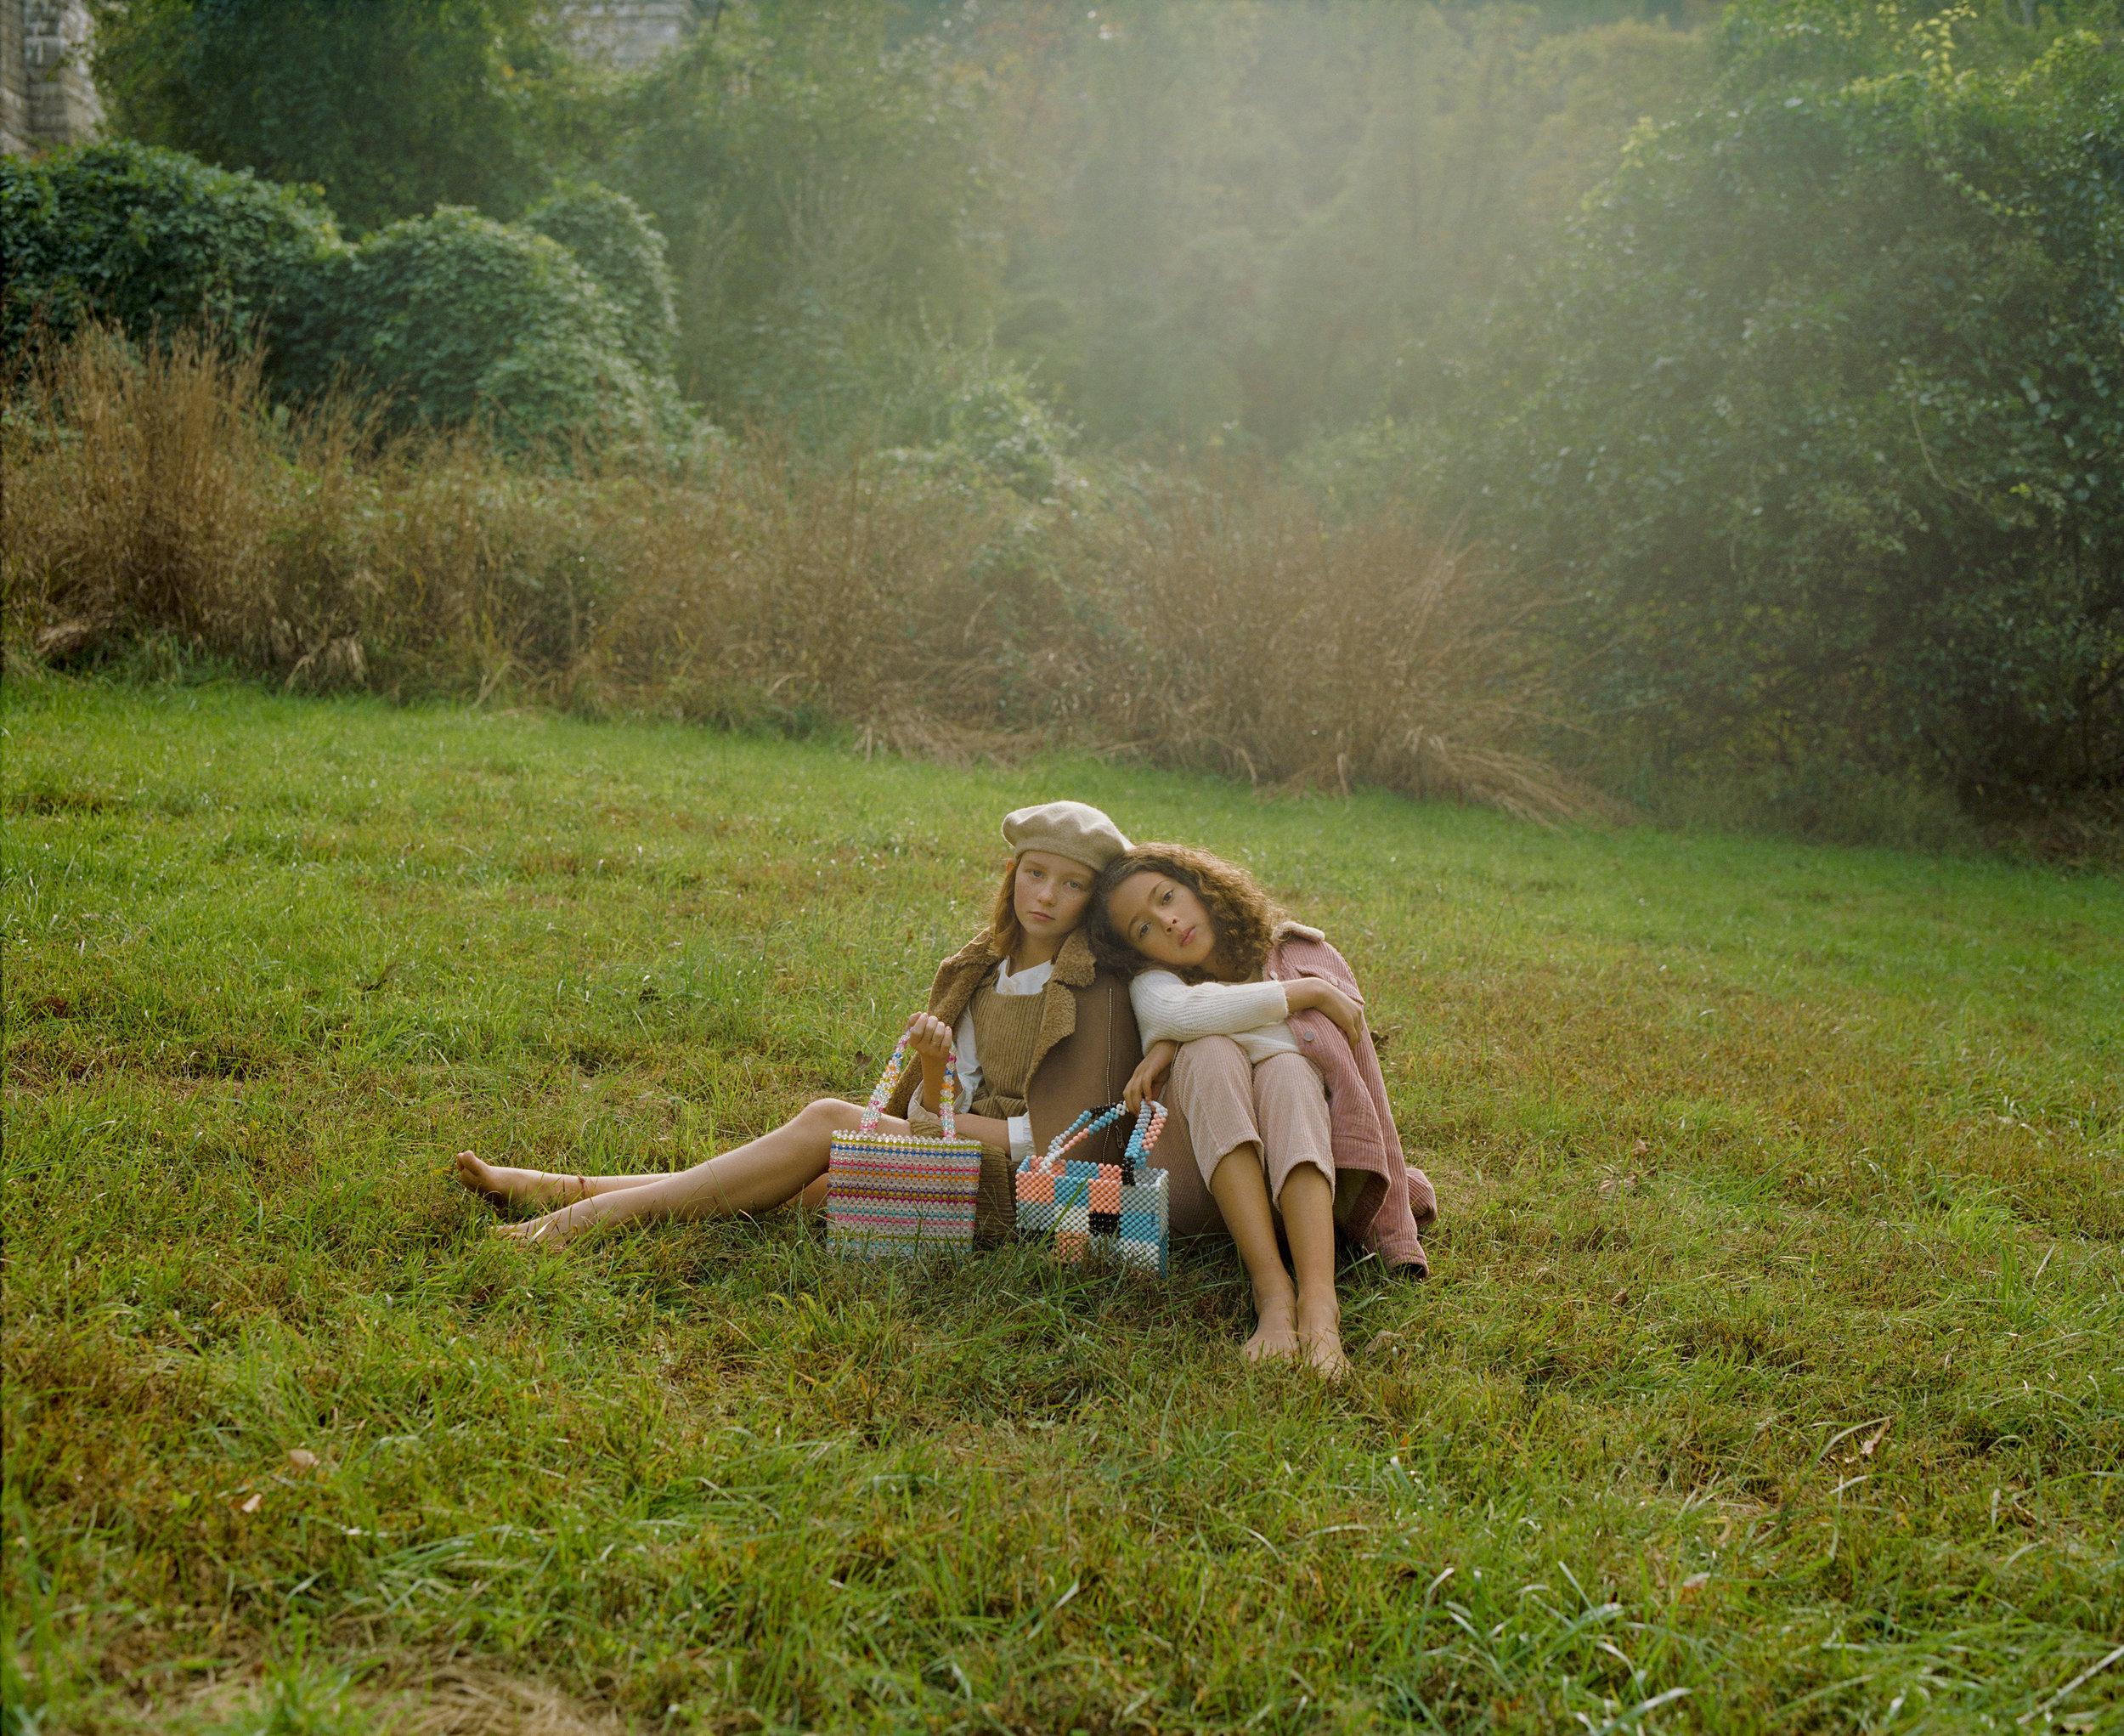 Creative direction & production for Susan Alexandra photoshoot.